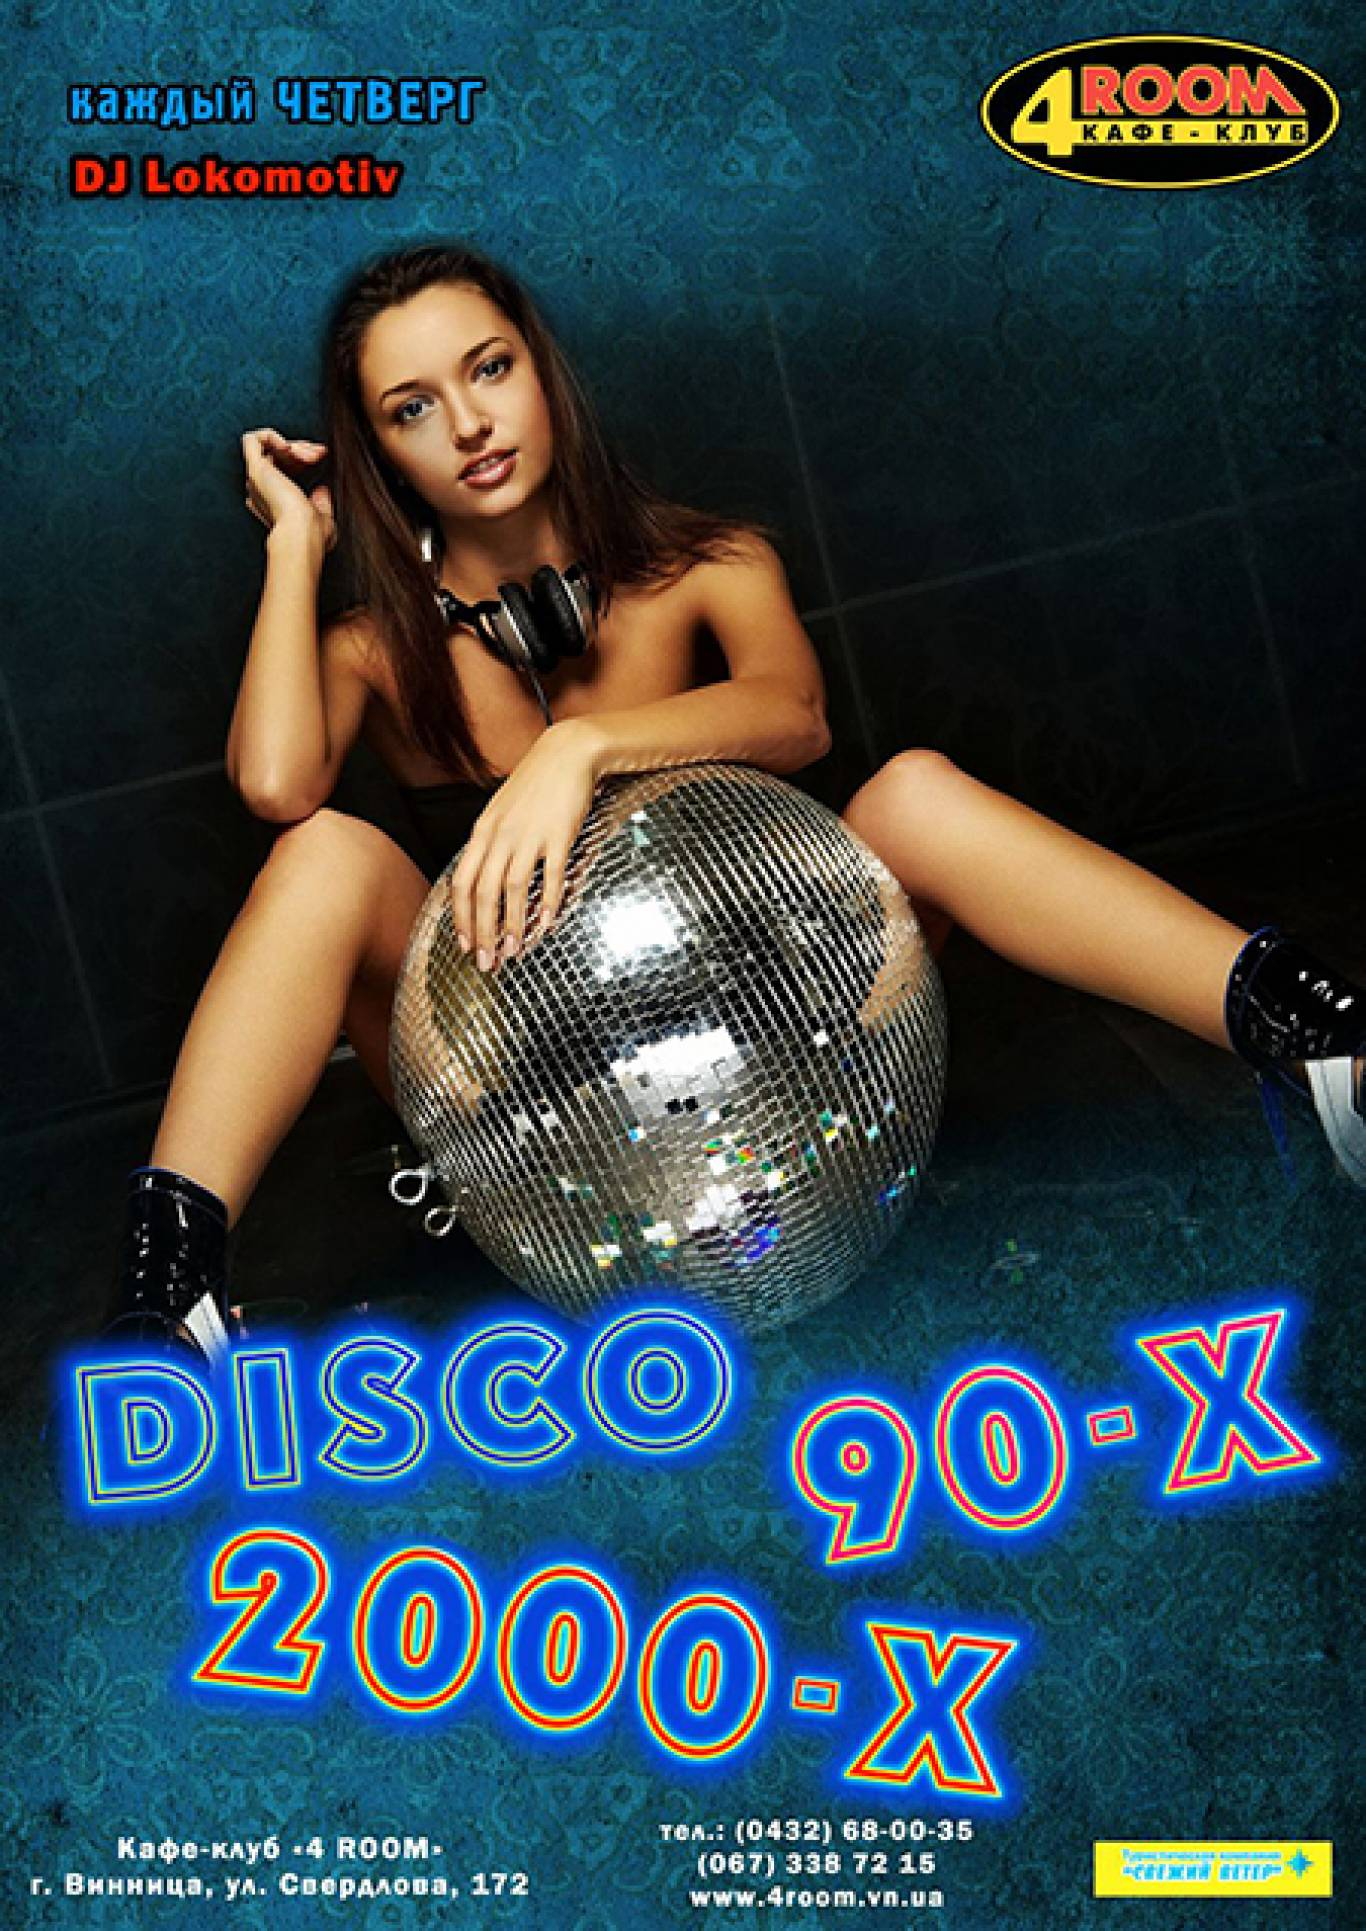 Disco 90-х та 2000-х